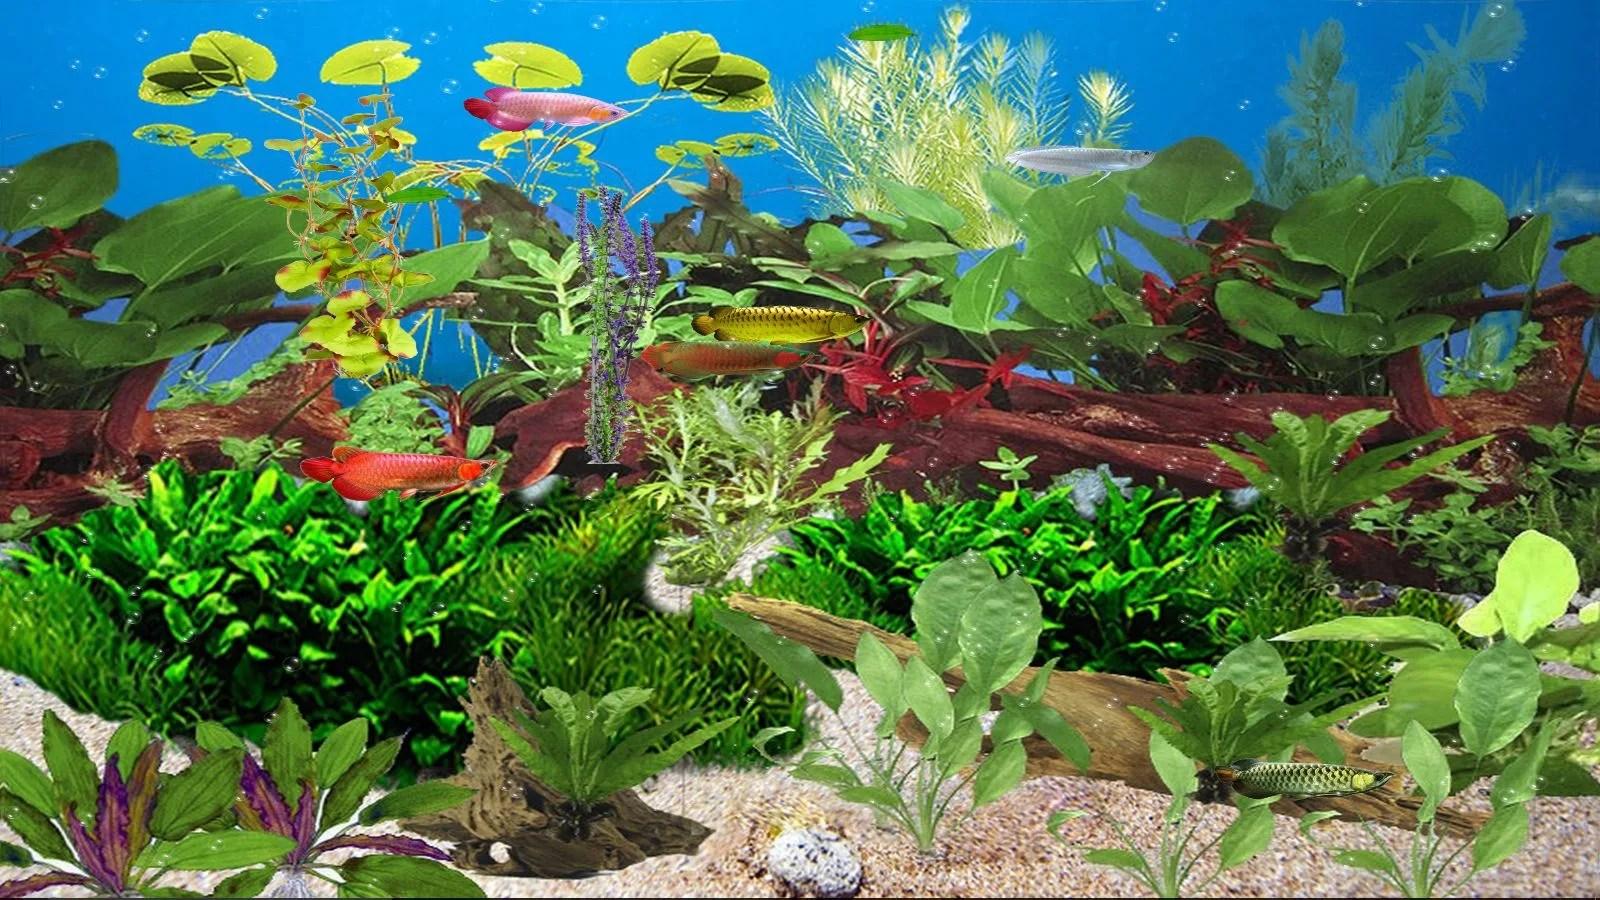 Arowana Fish 3d Live Wallpaper Aquarium Animated Wallpaper Download